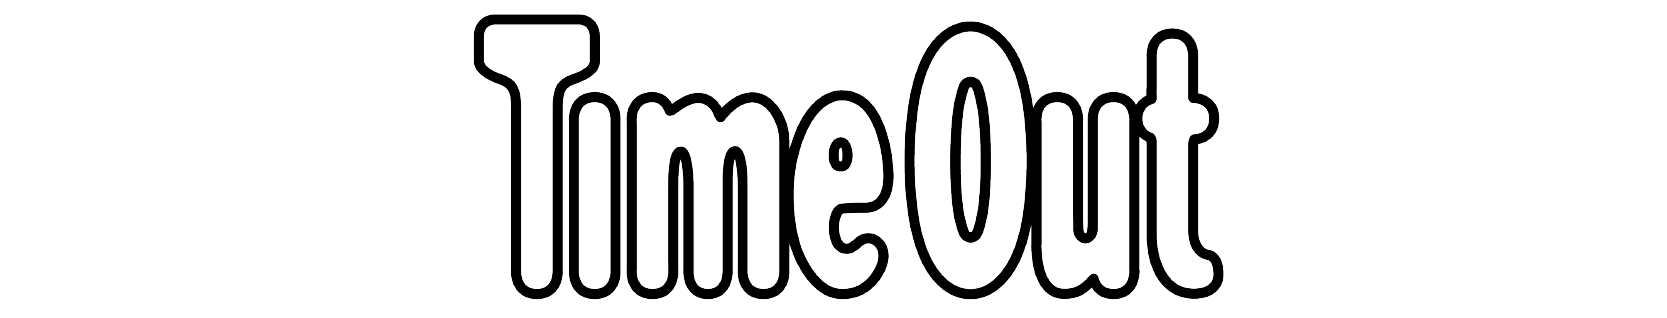 Press logos-05 copy_2.png